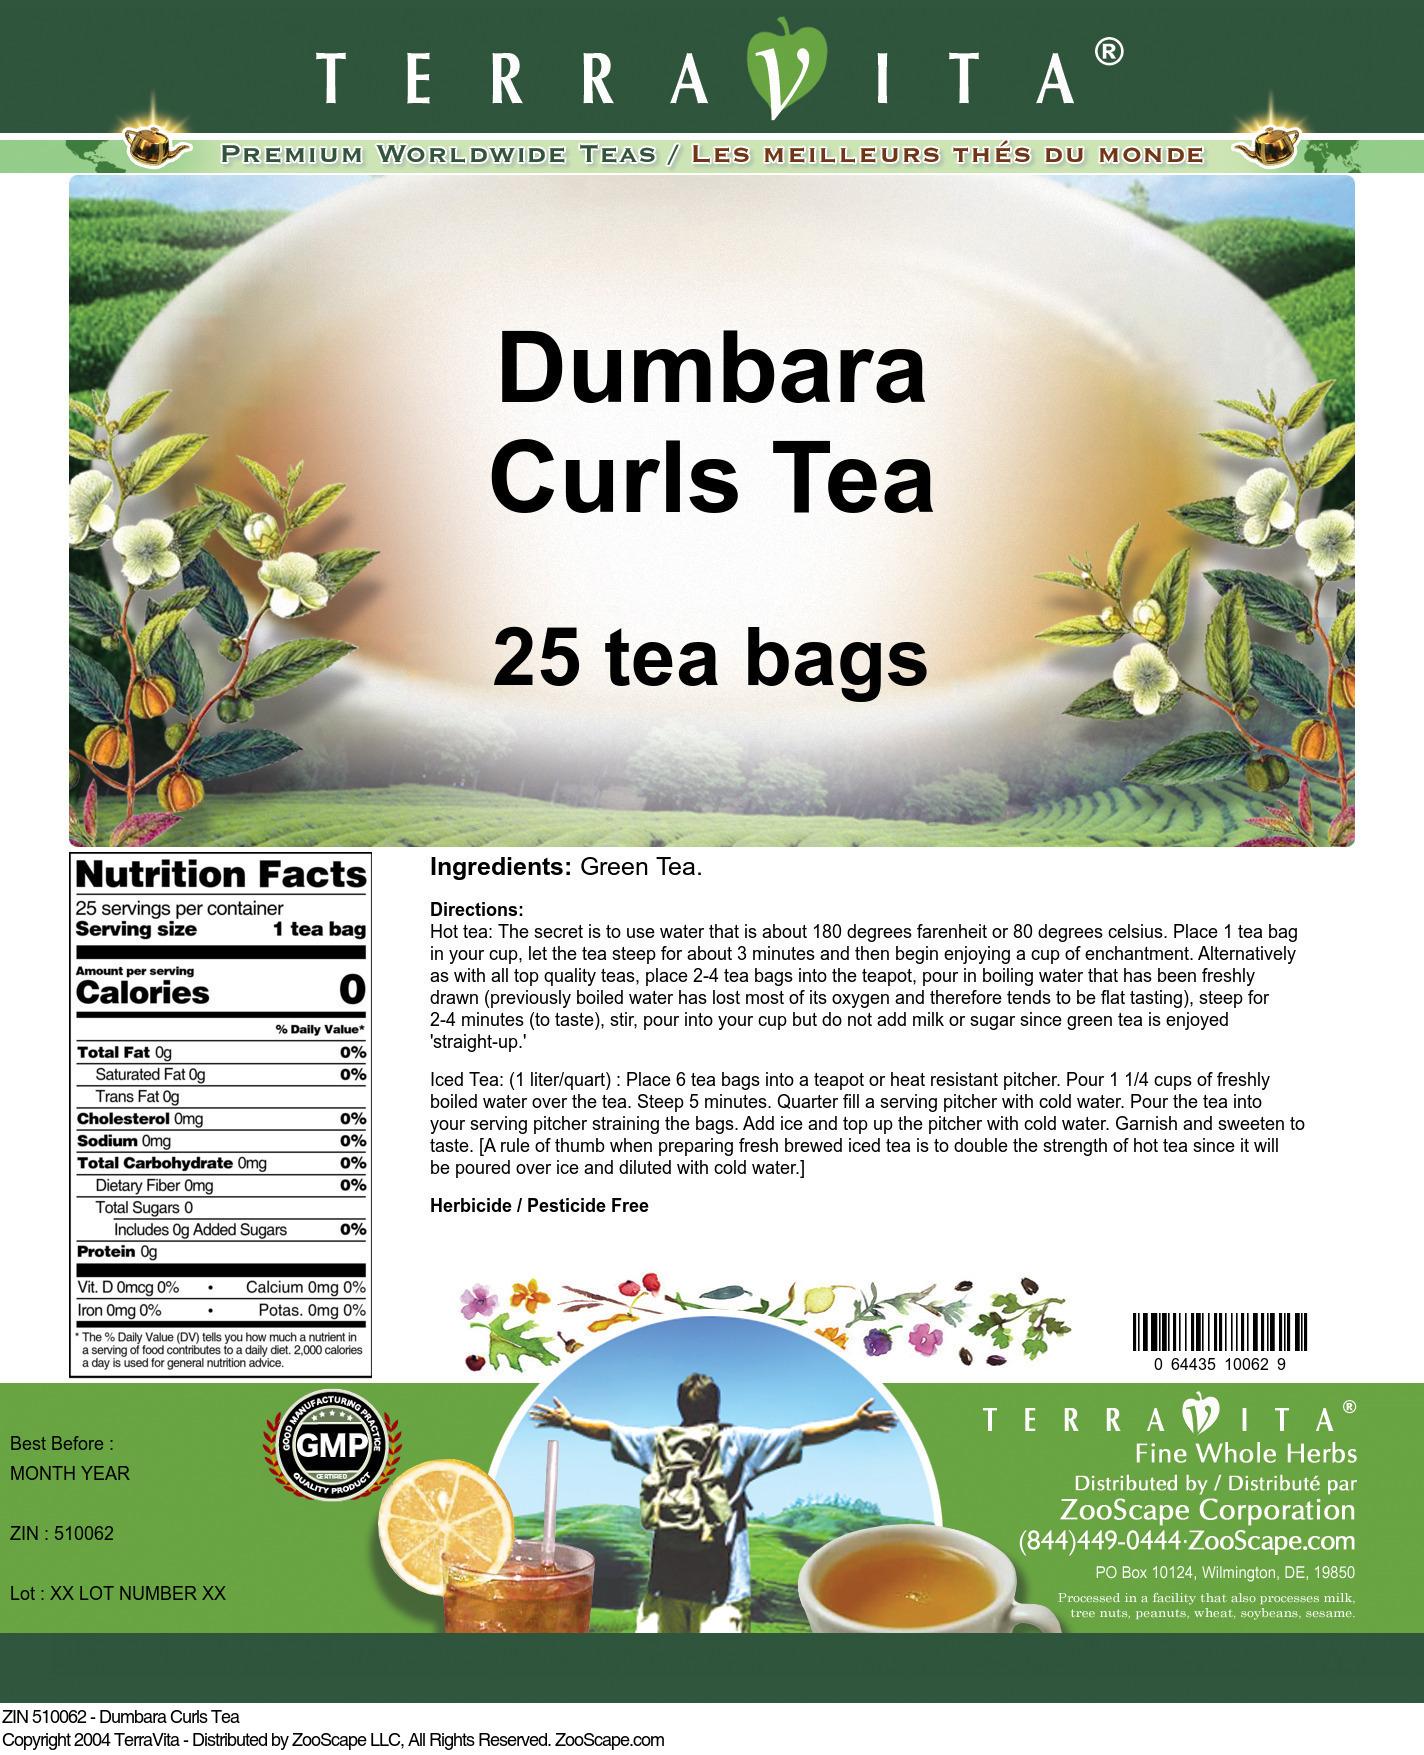 Dumbara Curls Tea